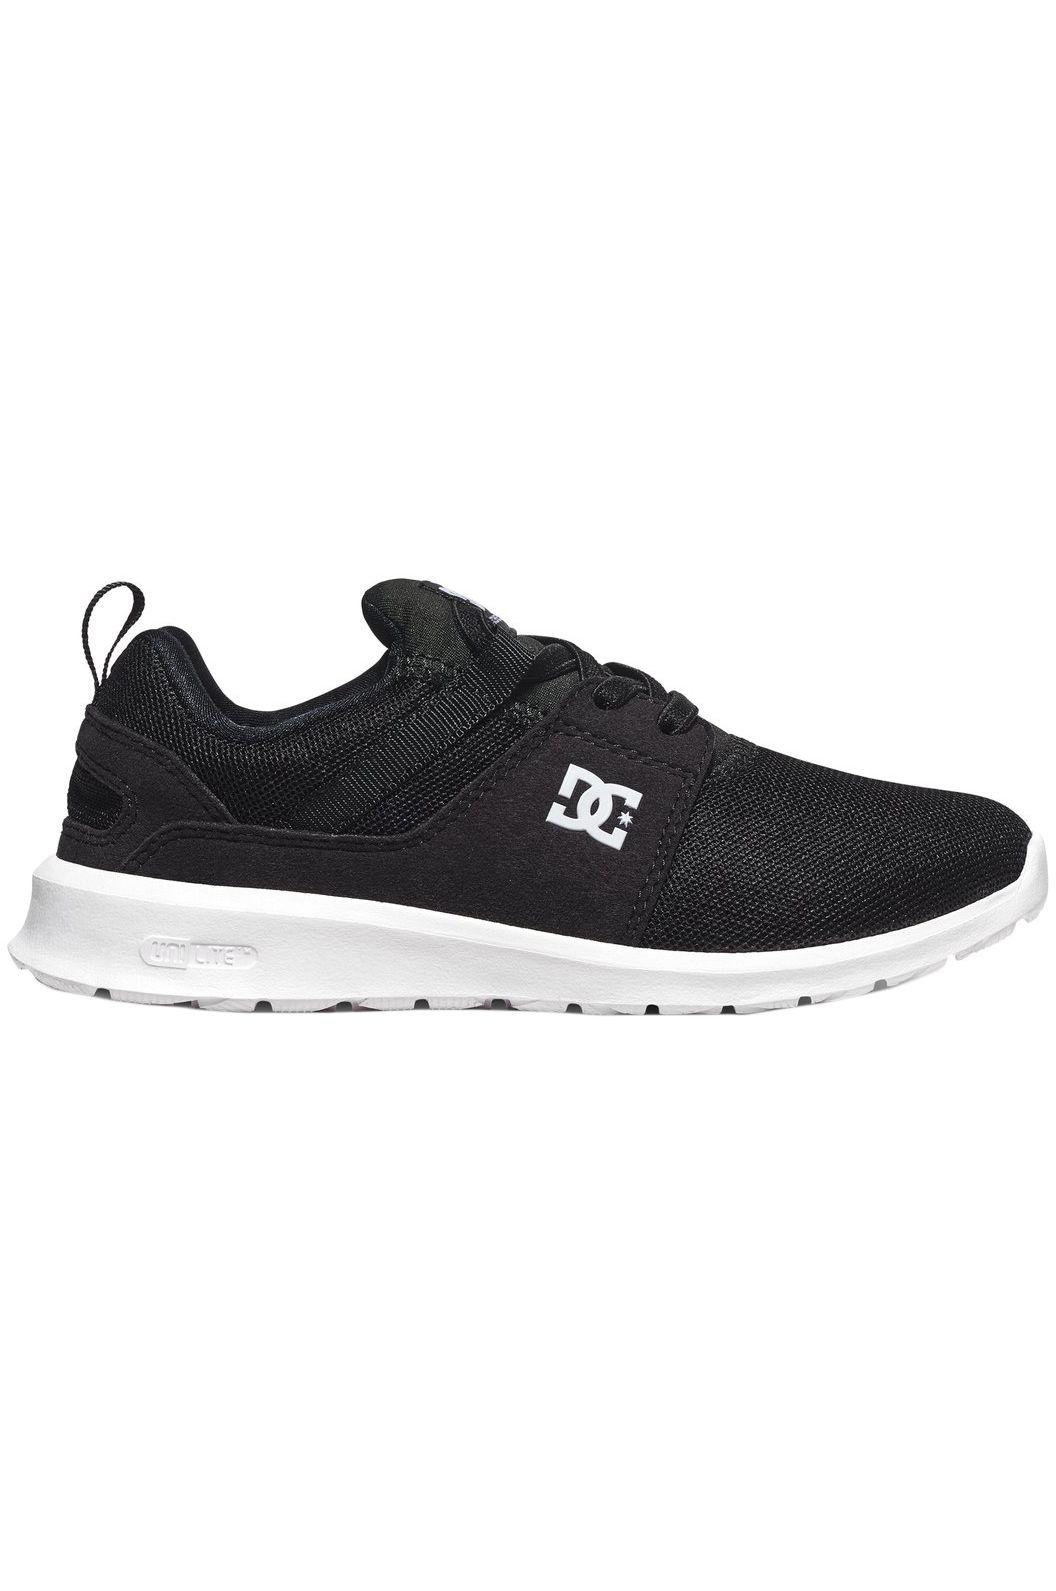 DC Shoes Shoes HEATHROW Black/White